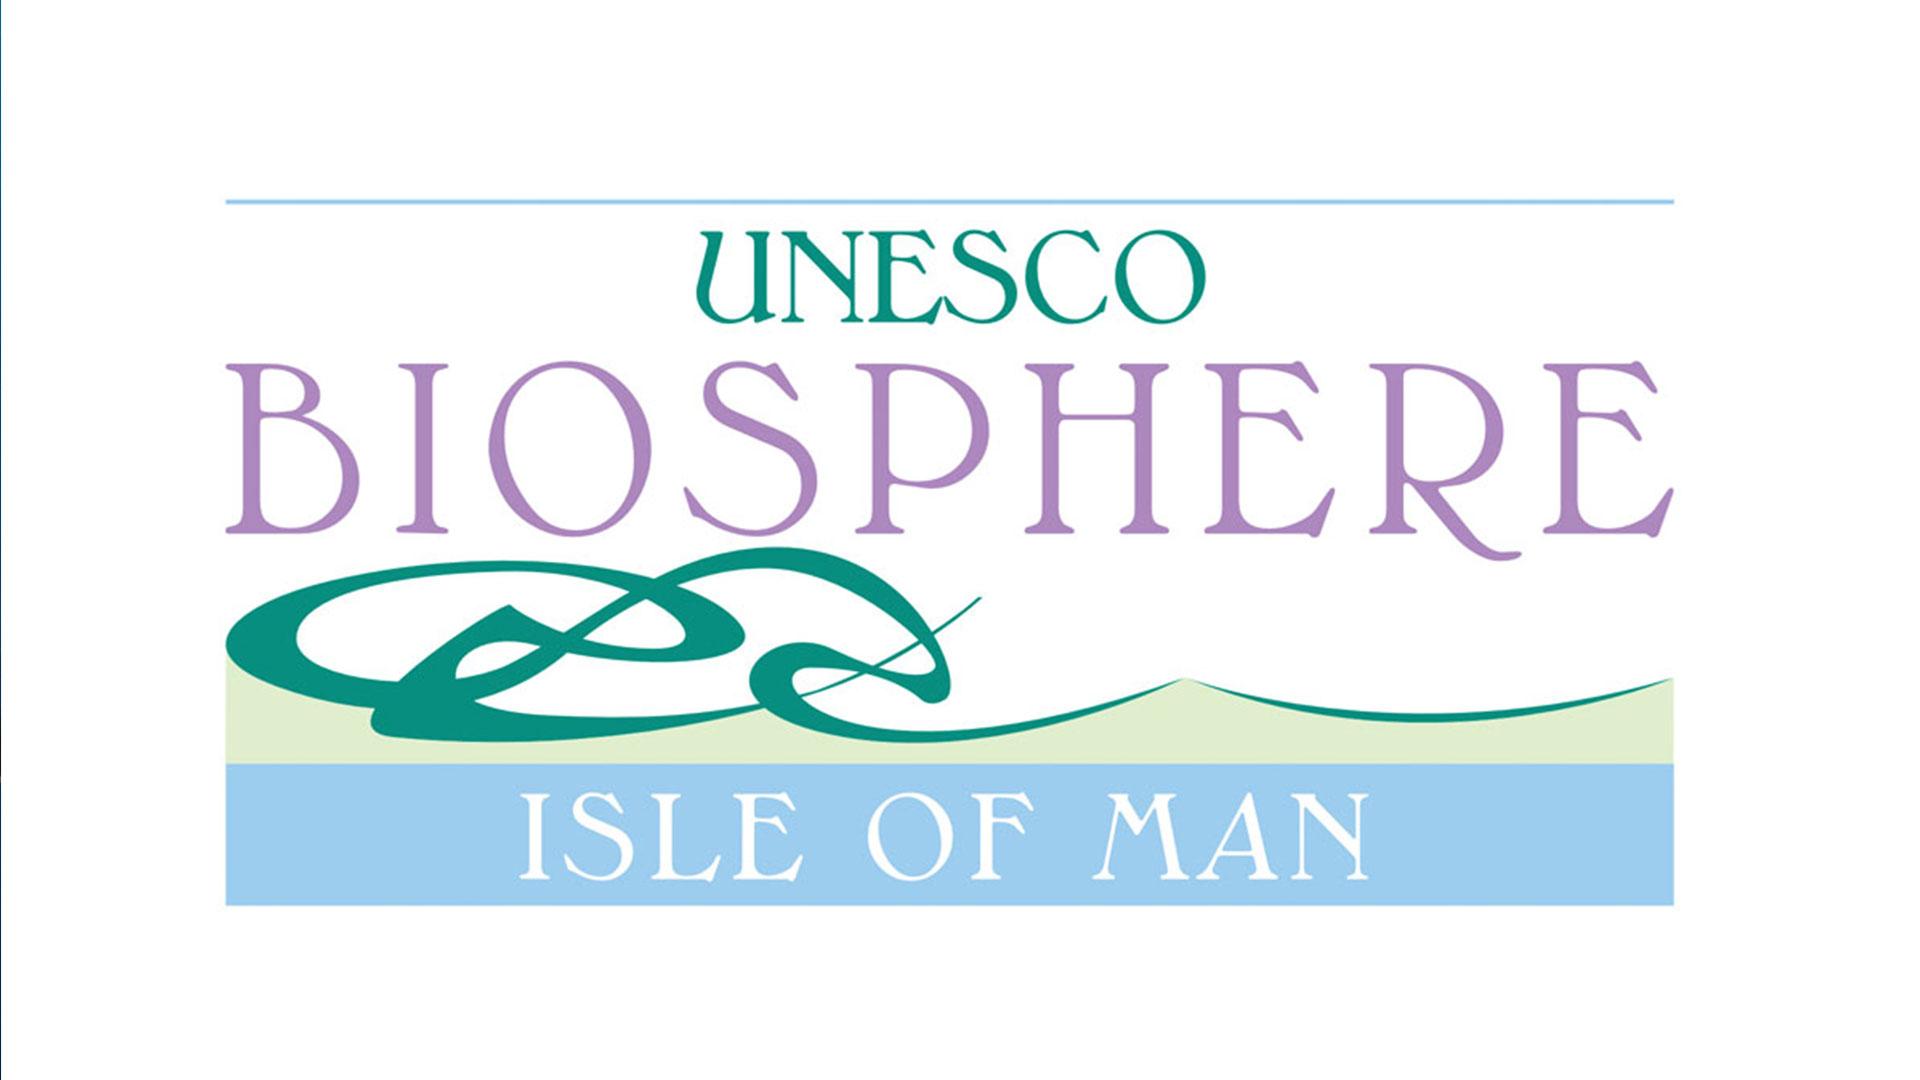 Proud Partners of UNESCO Biosphere Isle of Man